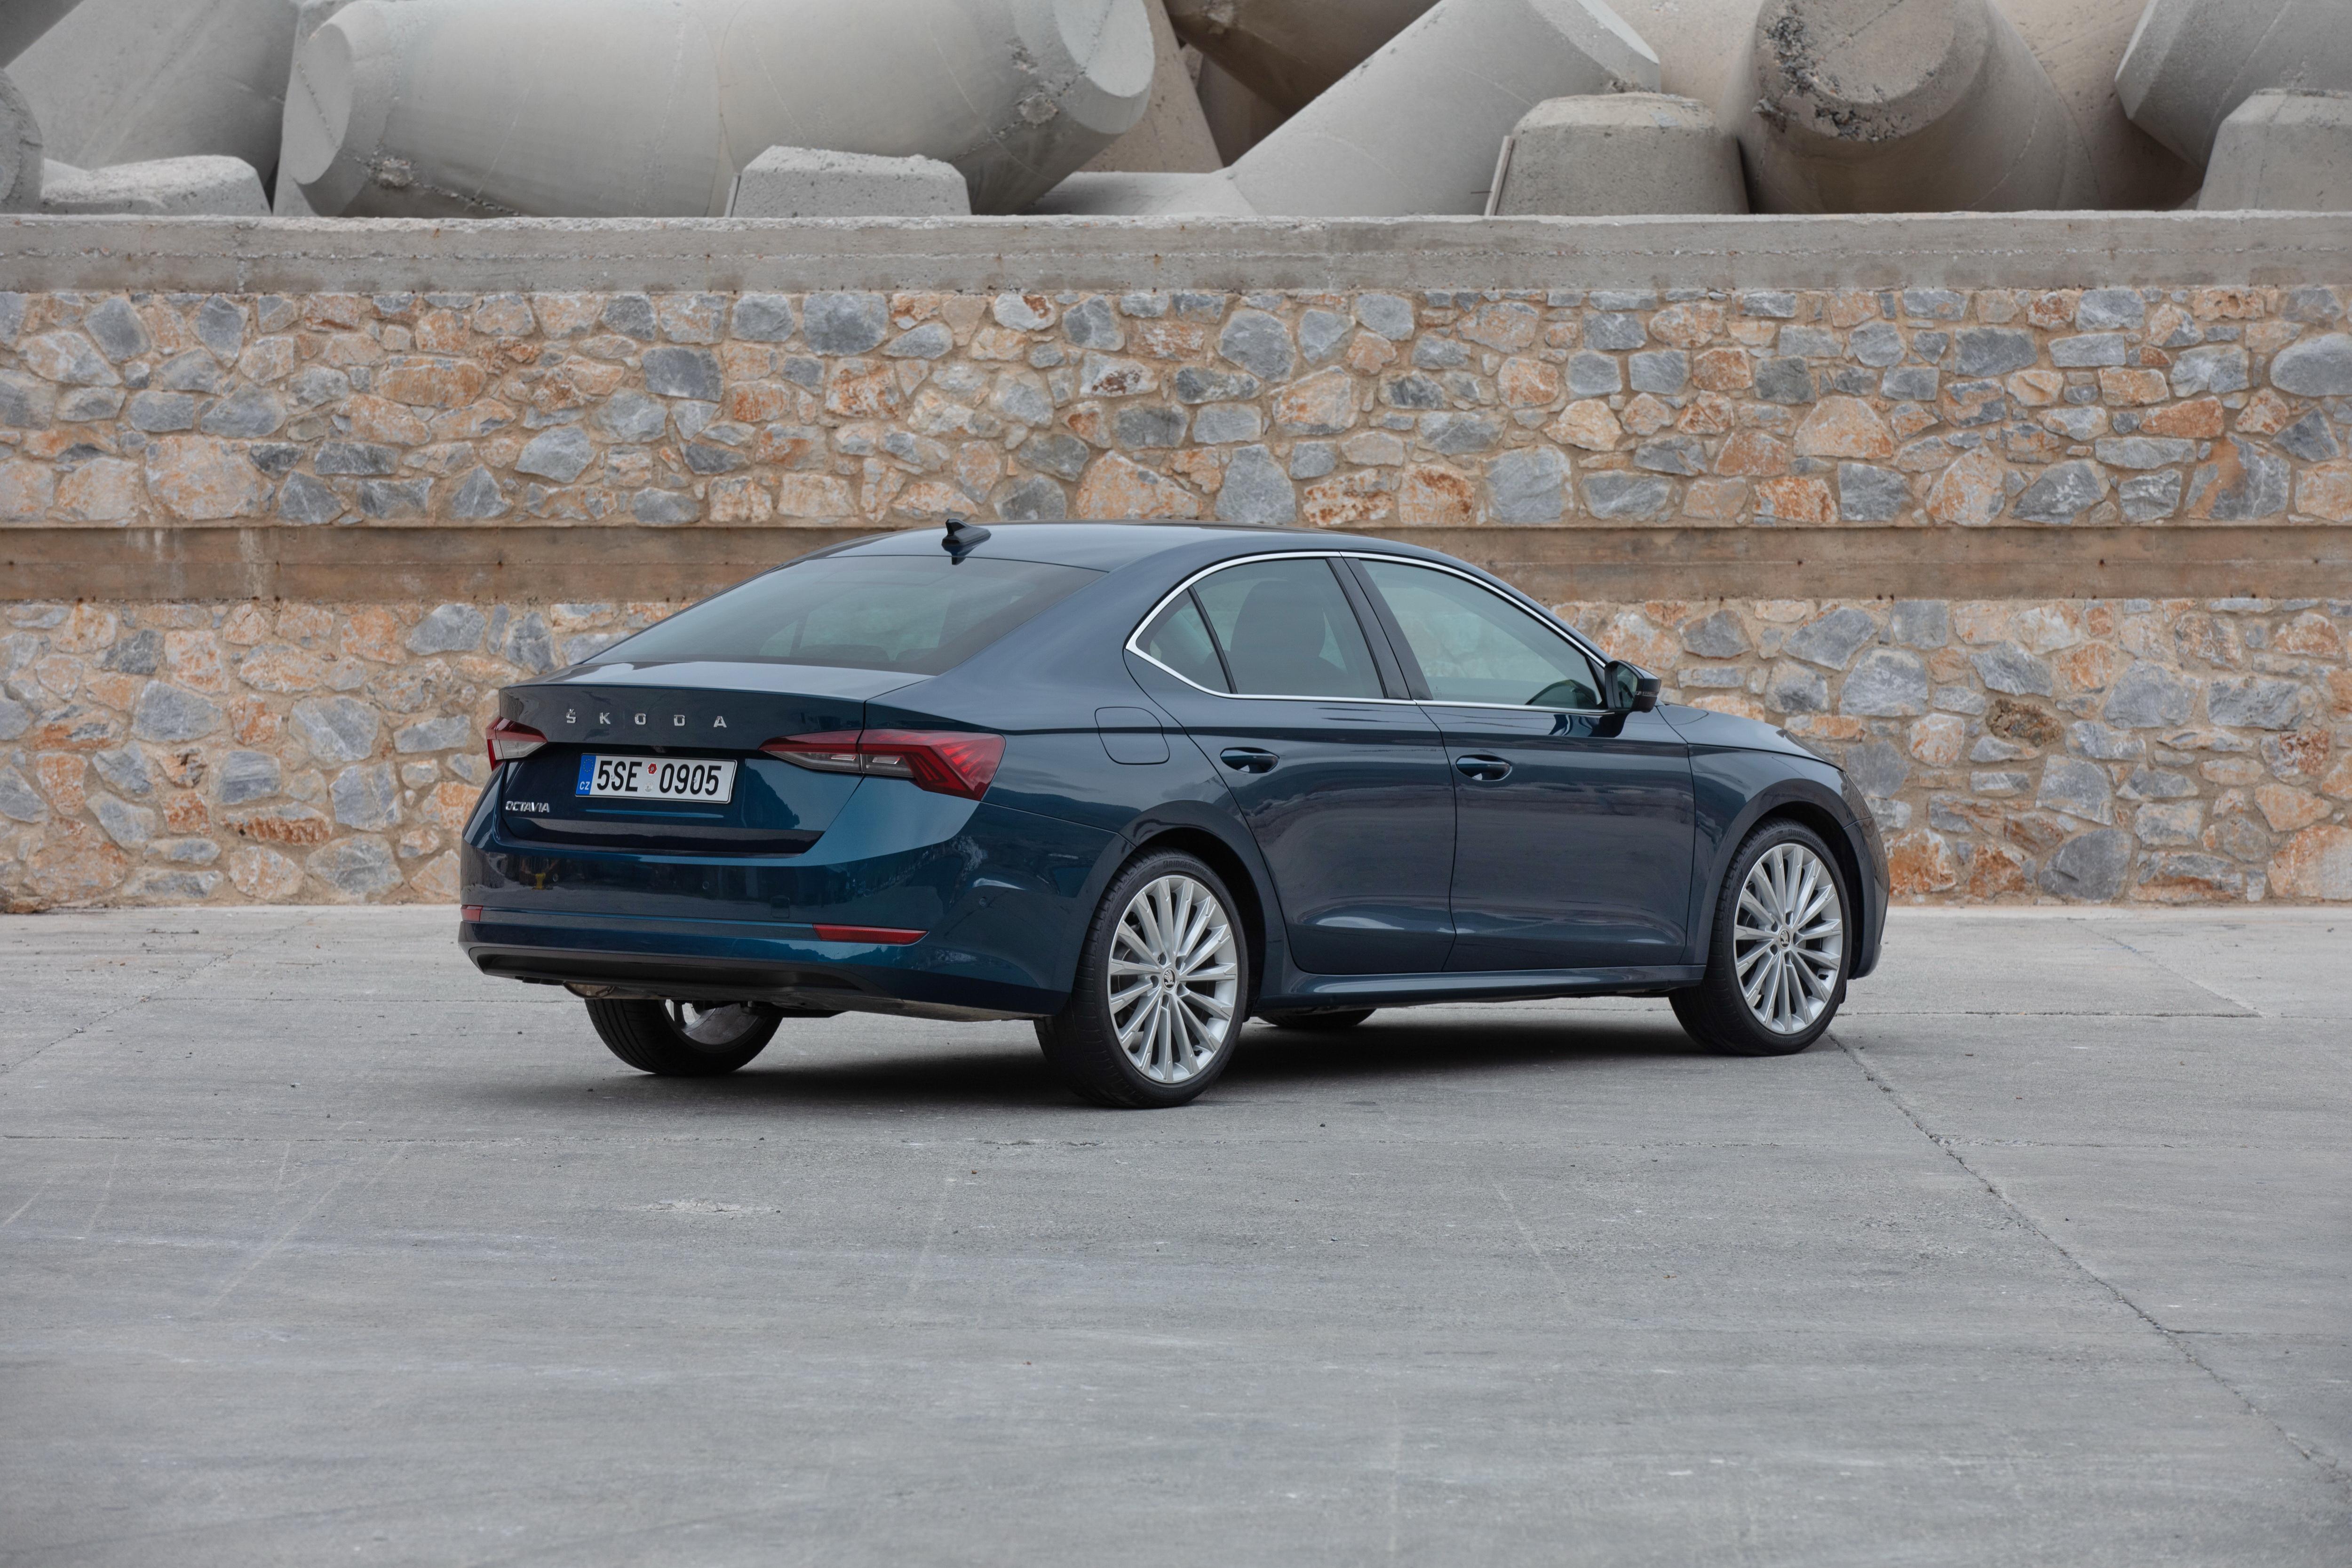 The all-new SKODA OCTAVIA: spacious, practical and elegant like a coupé - Image 6